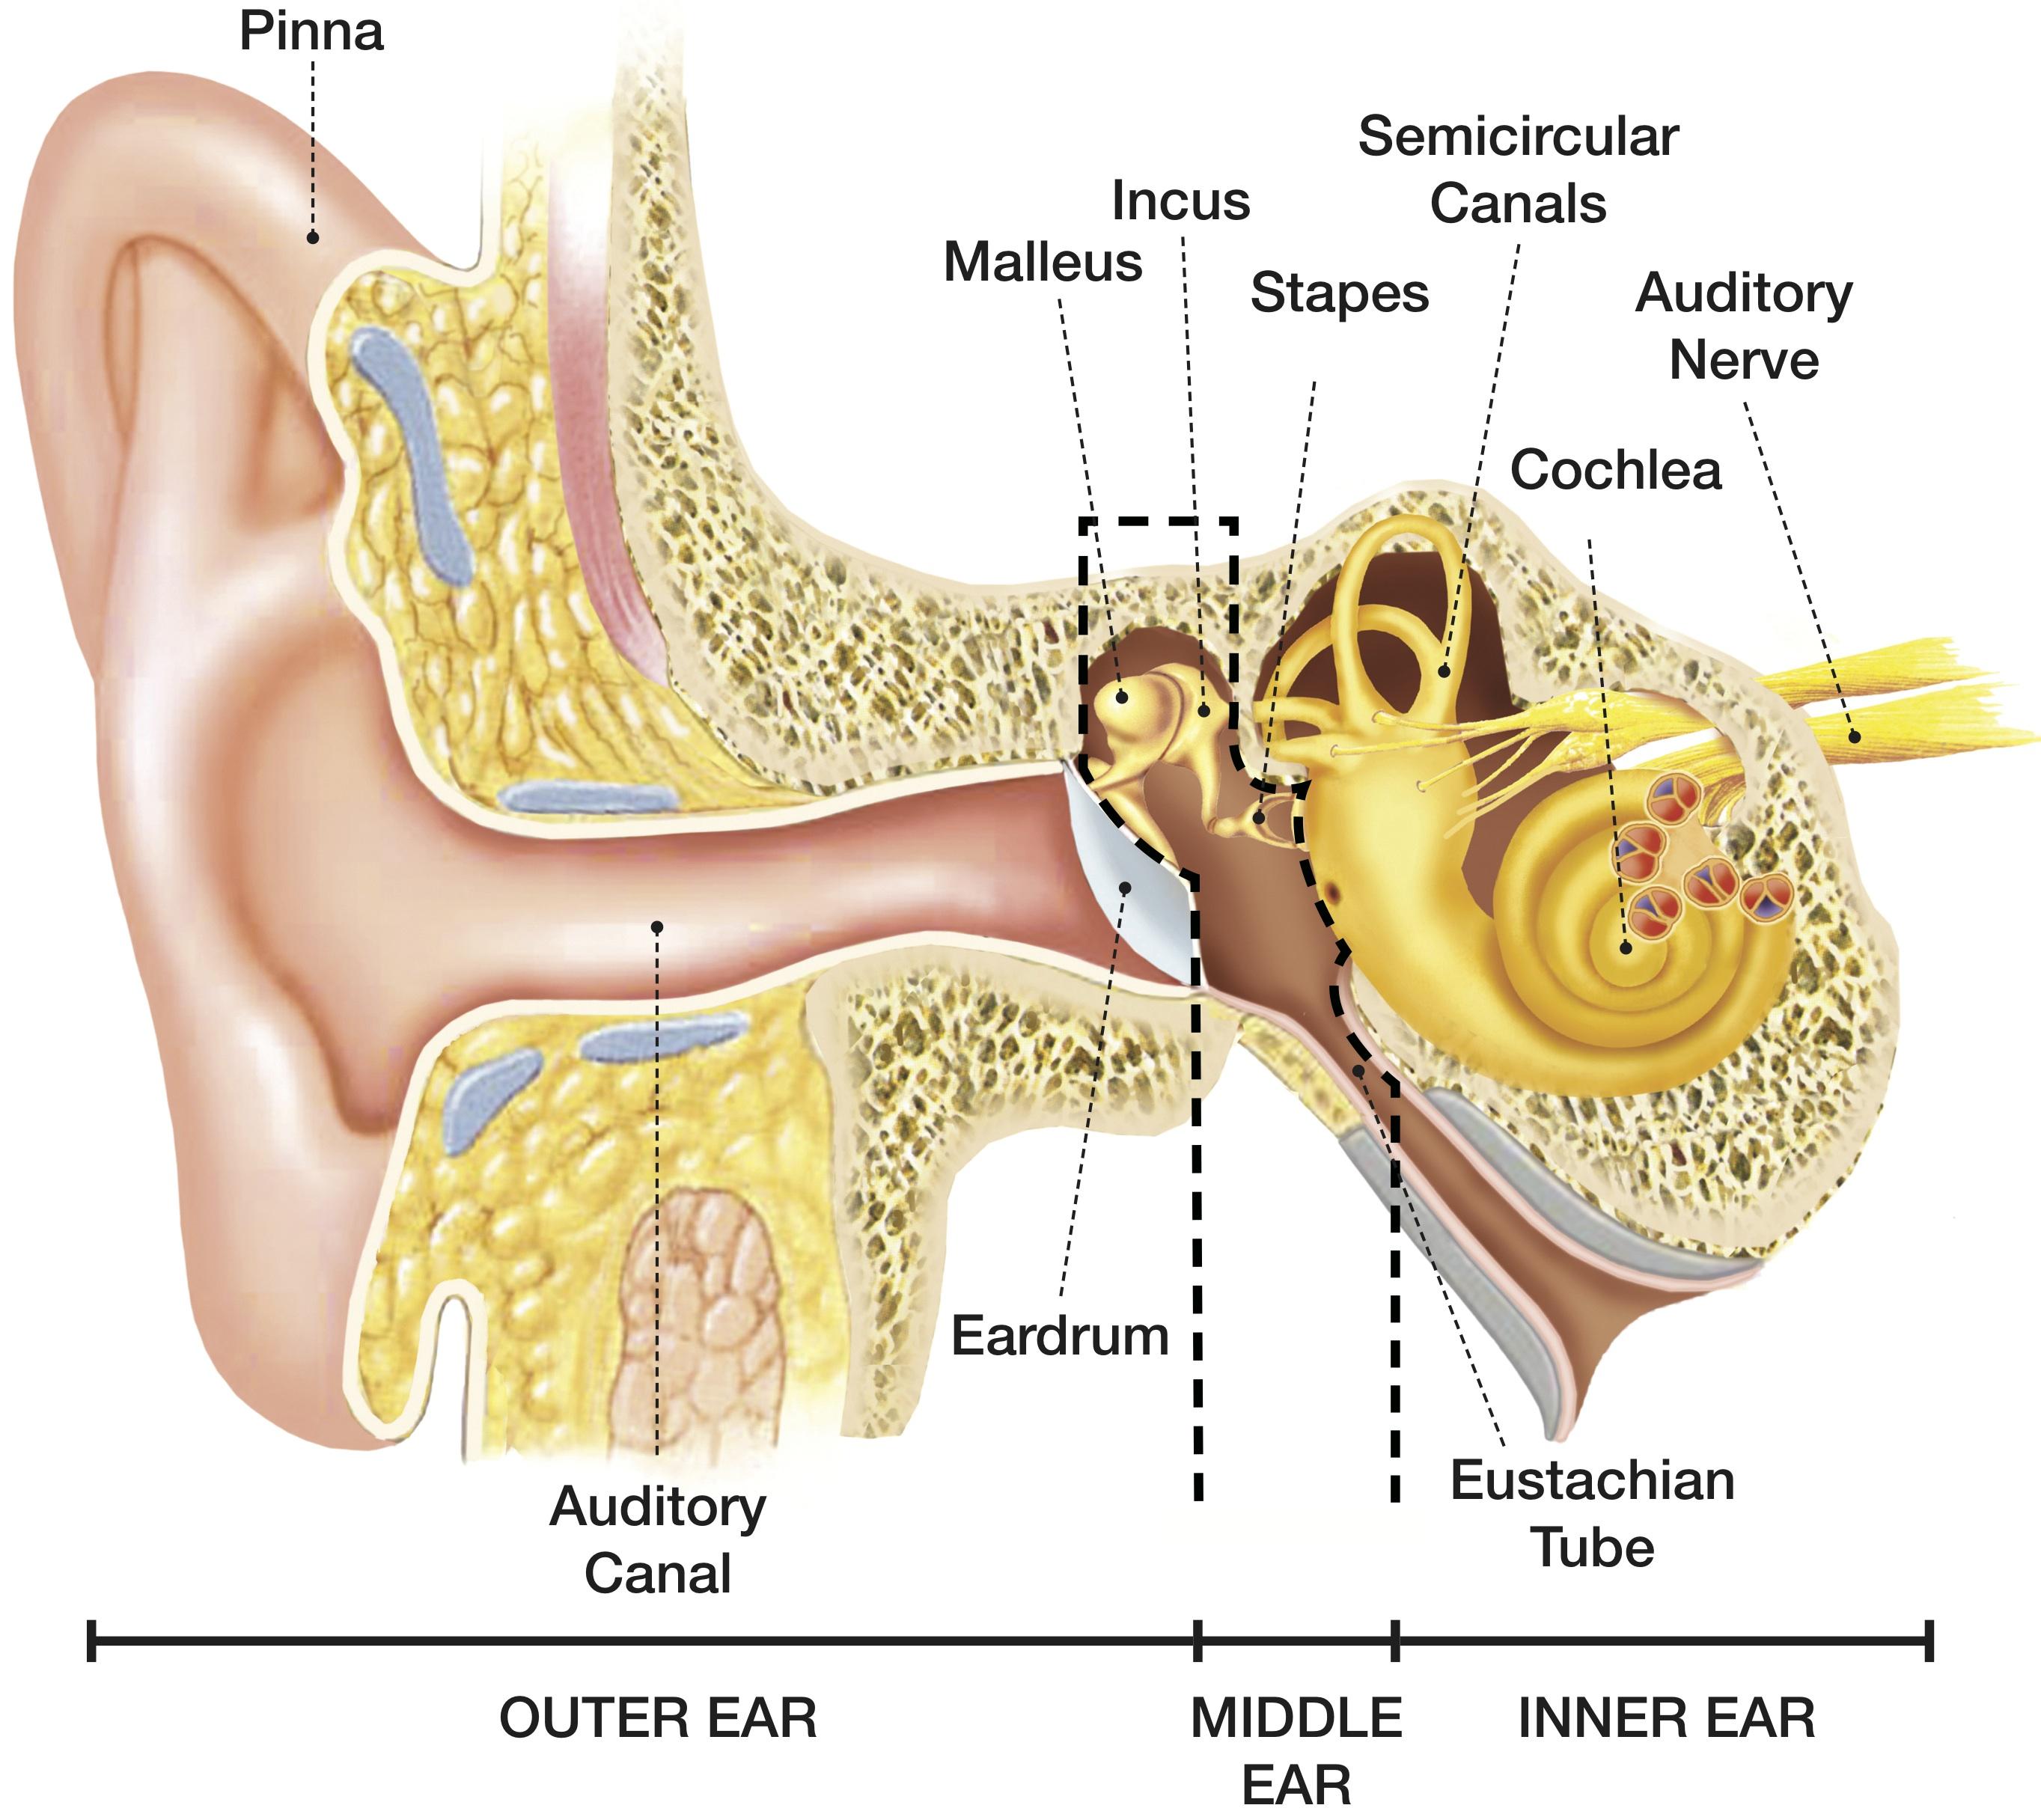 stapes anatomy diagram kidde smoke and carbon monoxide alarm wiring how we hear hearing associates inc